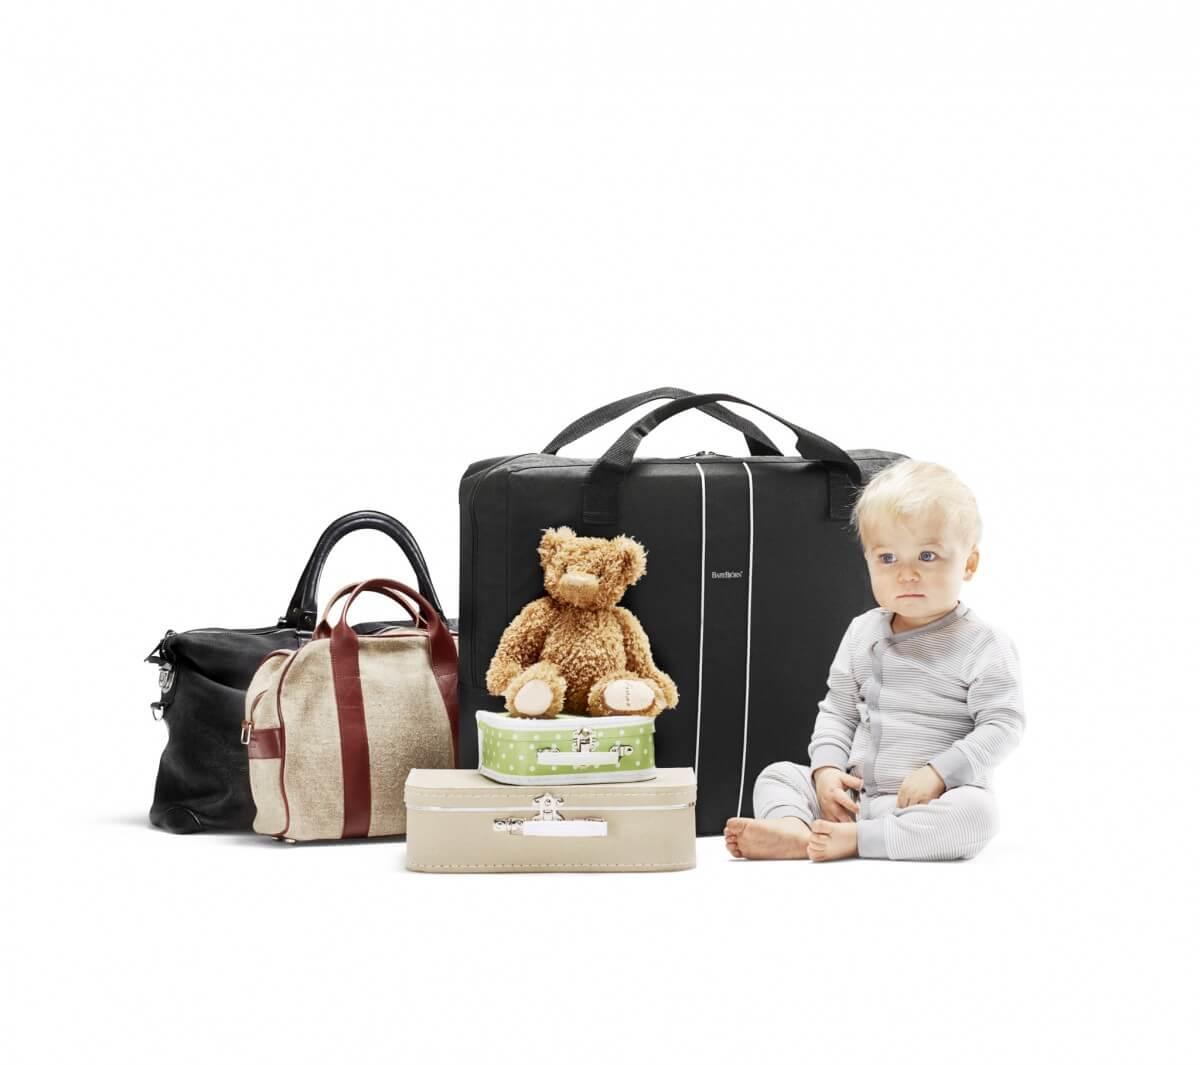 BabyBjorn Travel Cot Light Bag